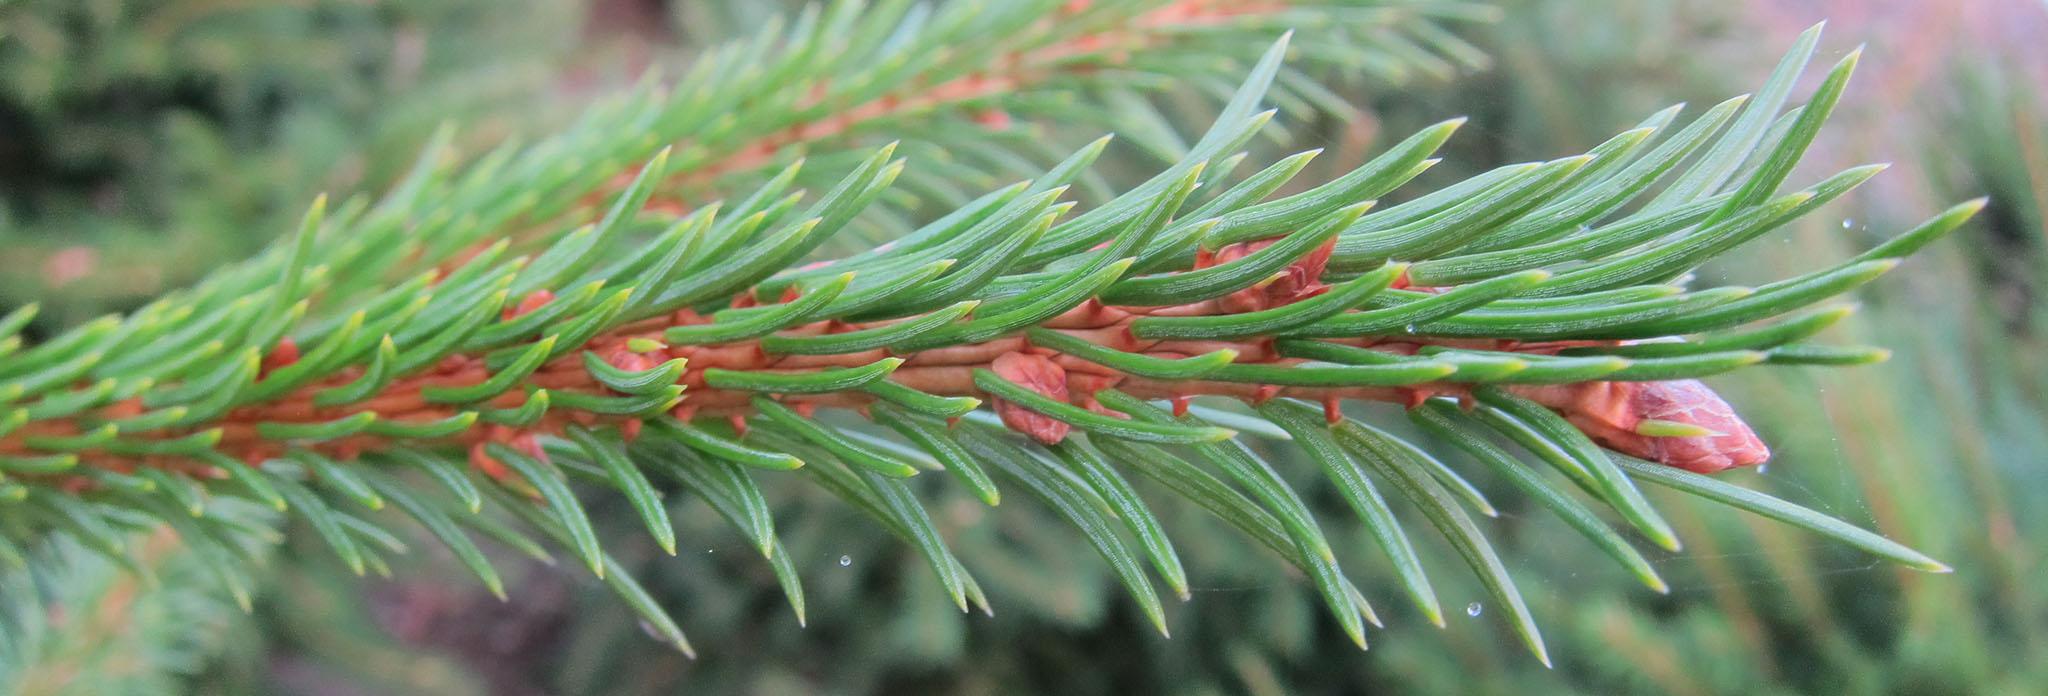 Norway Spruce Closeup